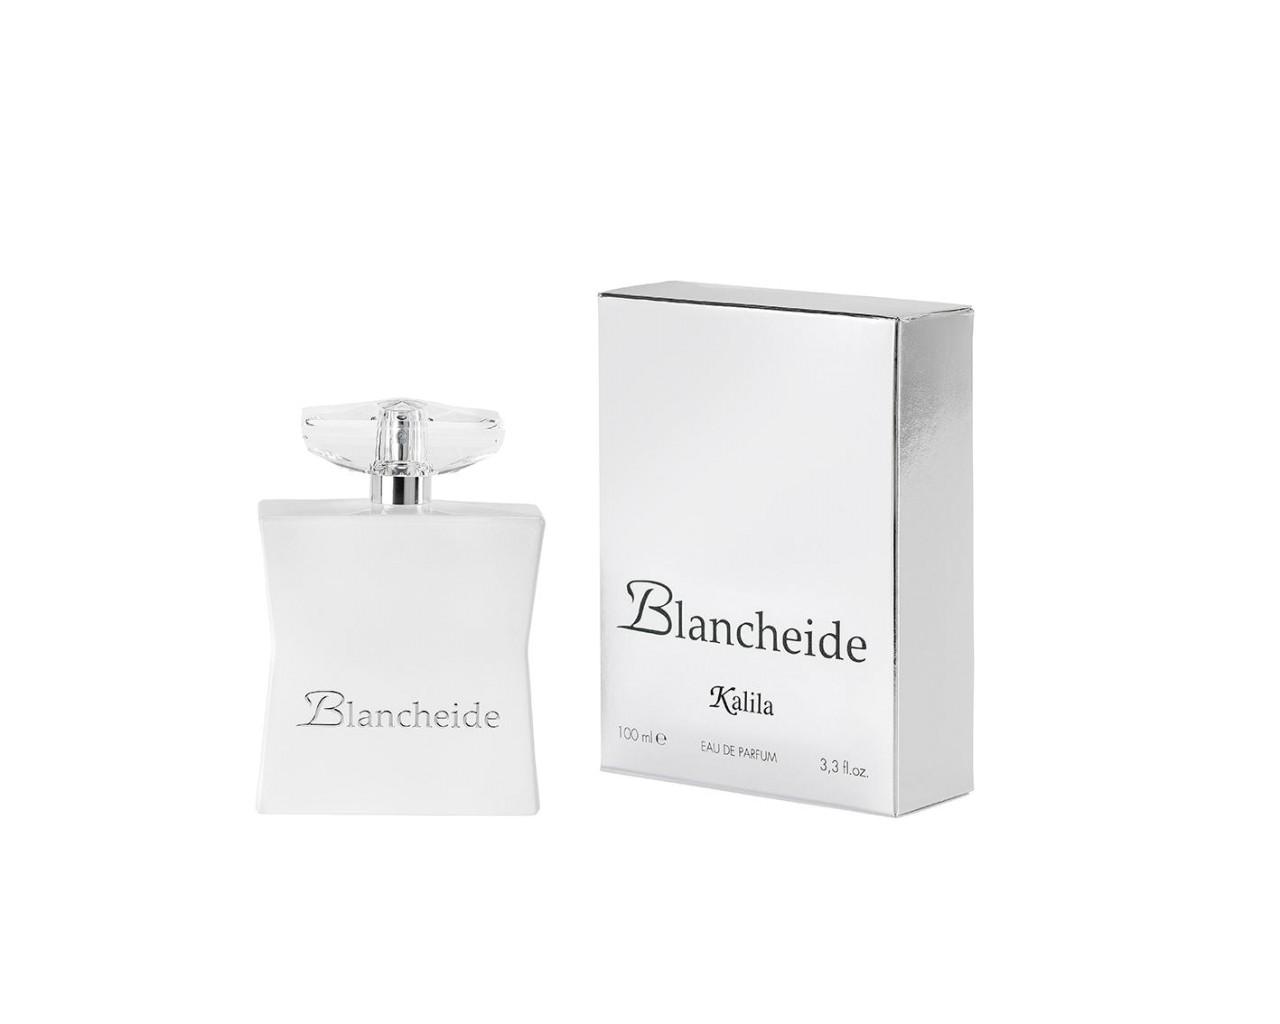 KALILA BLANCHEIDE EDP 100 ML Blancheide BLAV100KA-01